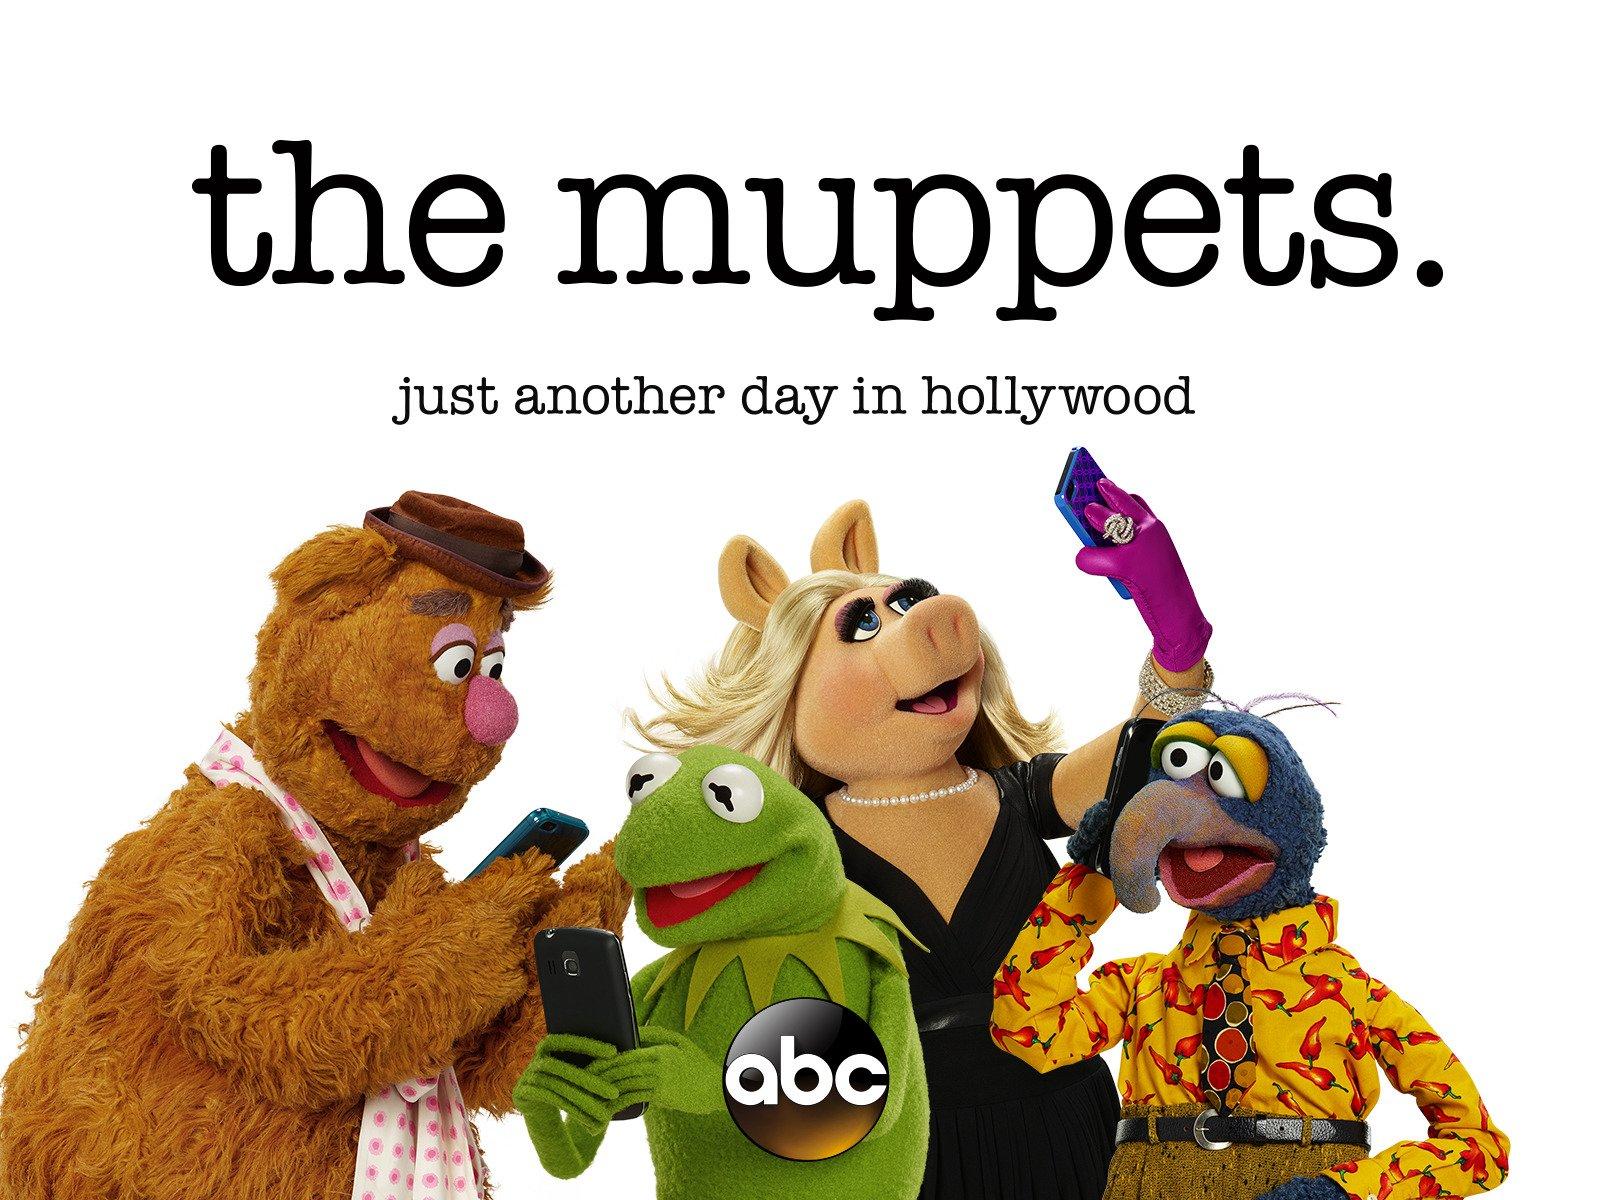 Amazon.com: The Muppets Season 1: Amazon Digital Services LLC